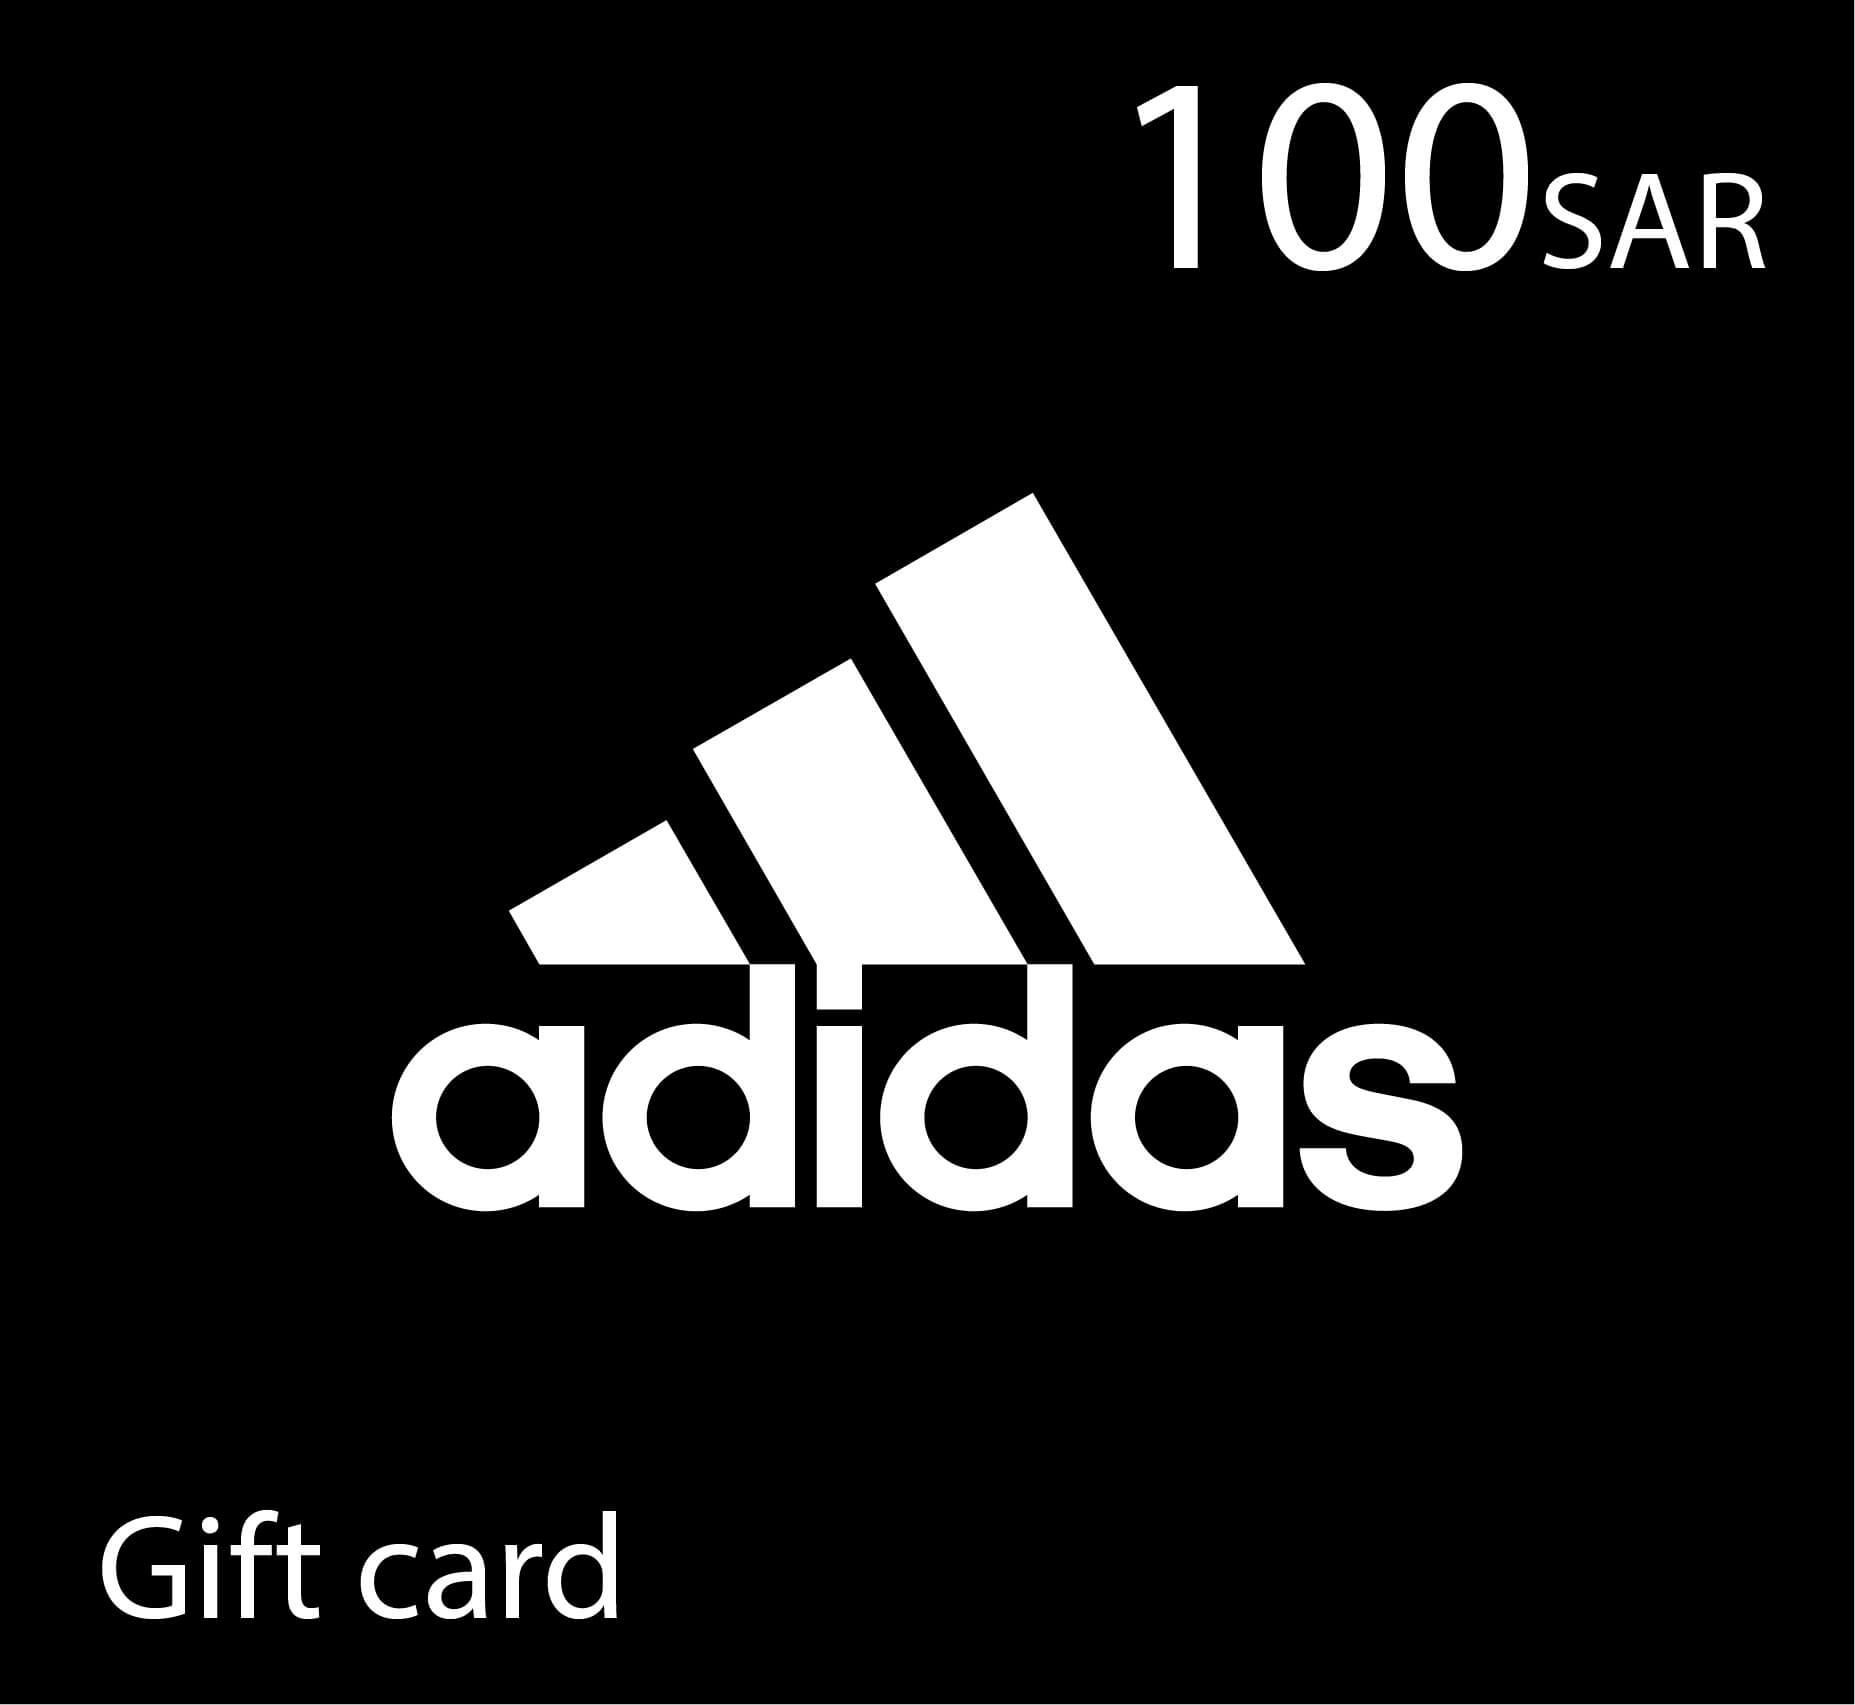 Adidas Gift Card - 100 SAR